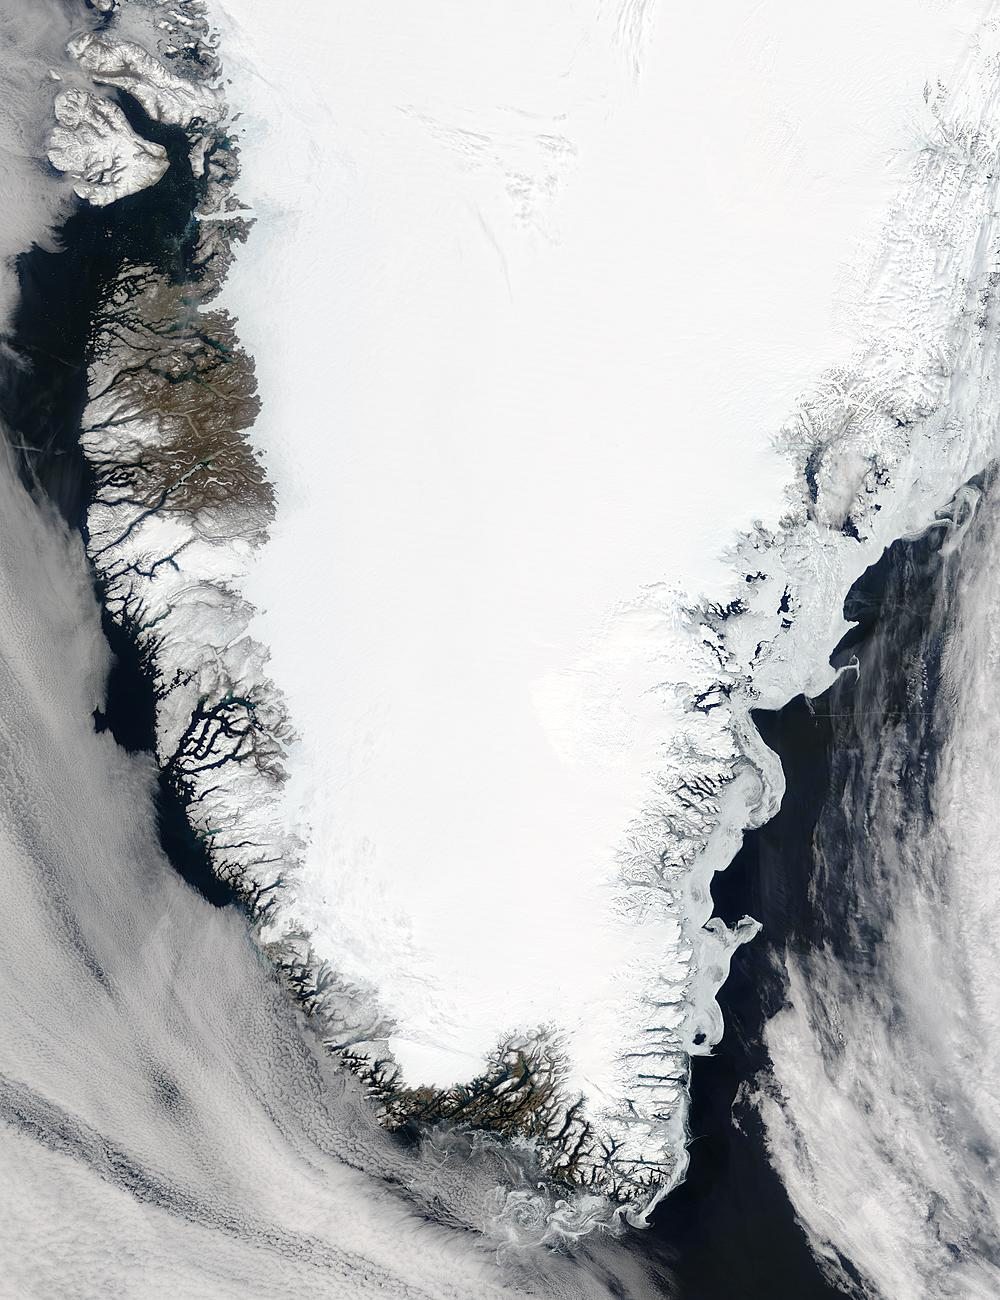 2004/150 - 05/29 at 14 :25 UTC Southern Greenland Satellite: Terra